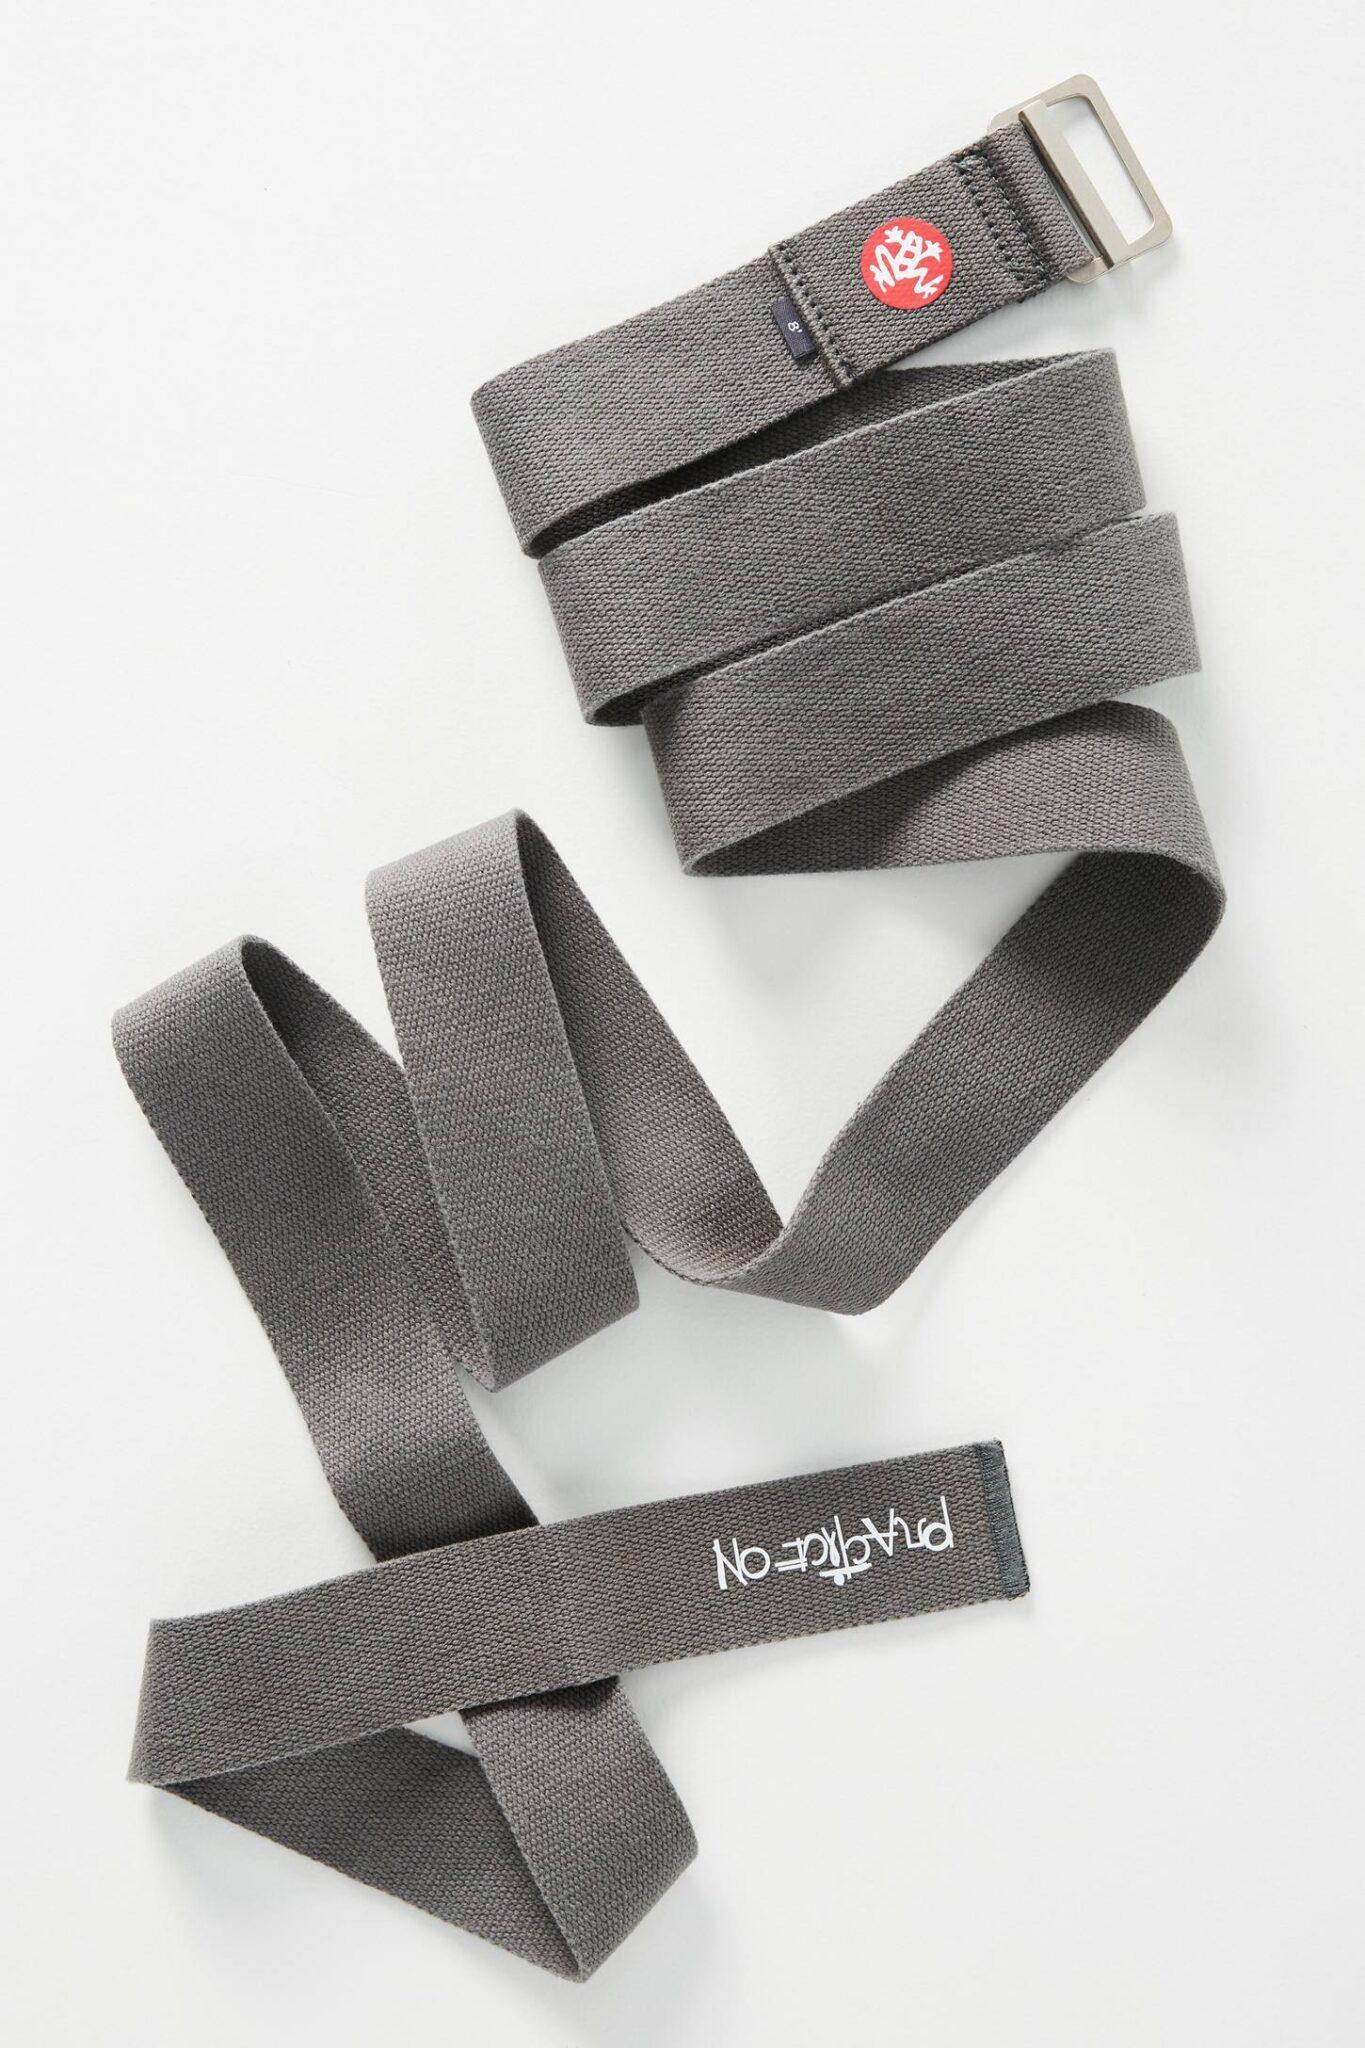 Manduka Align Yoga Strap $16.00